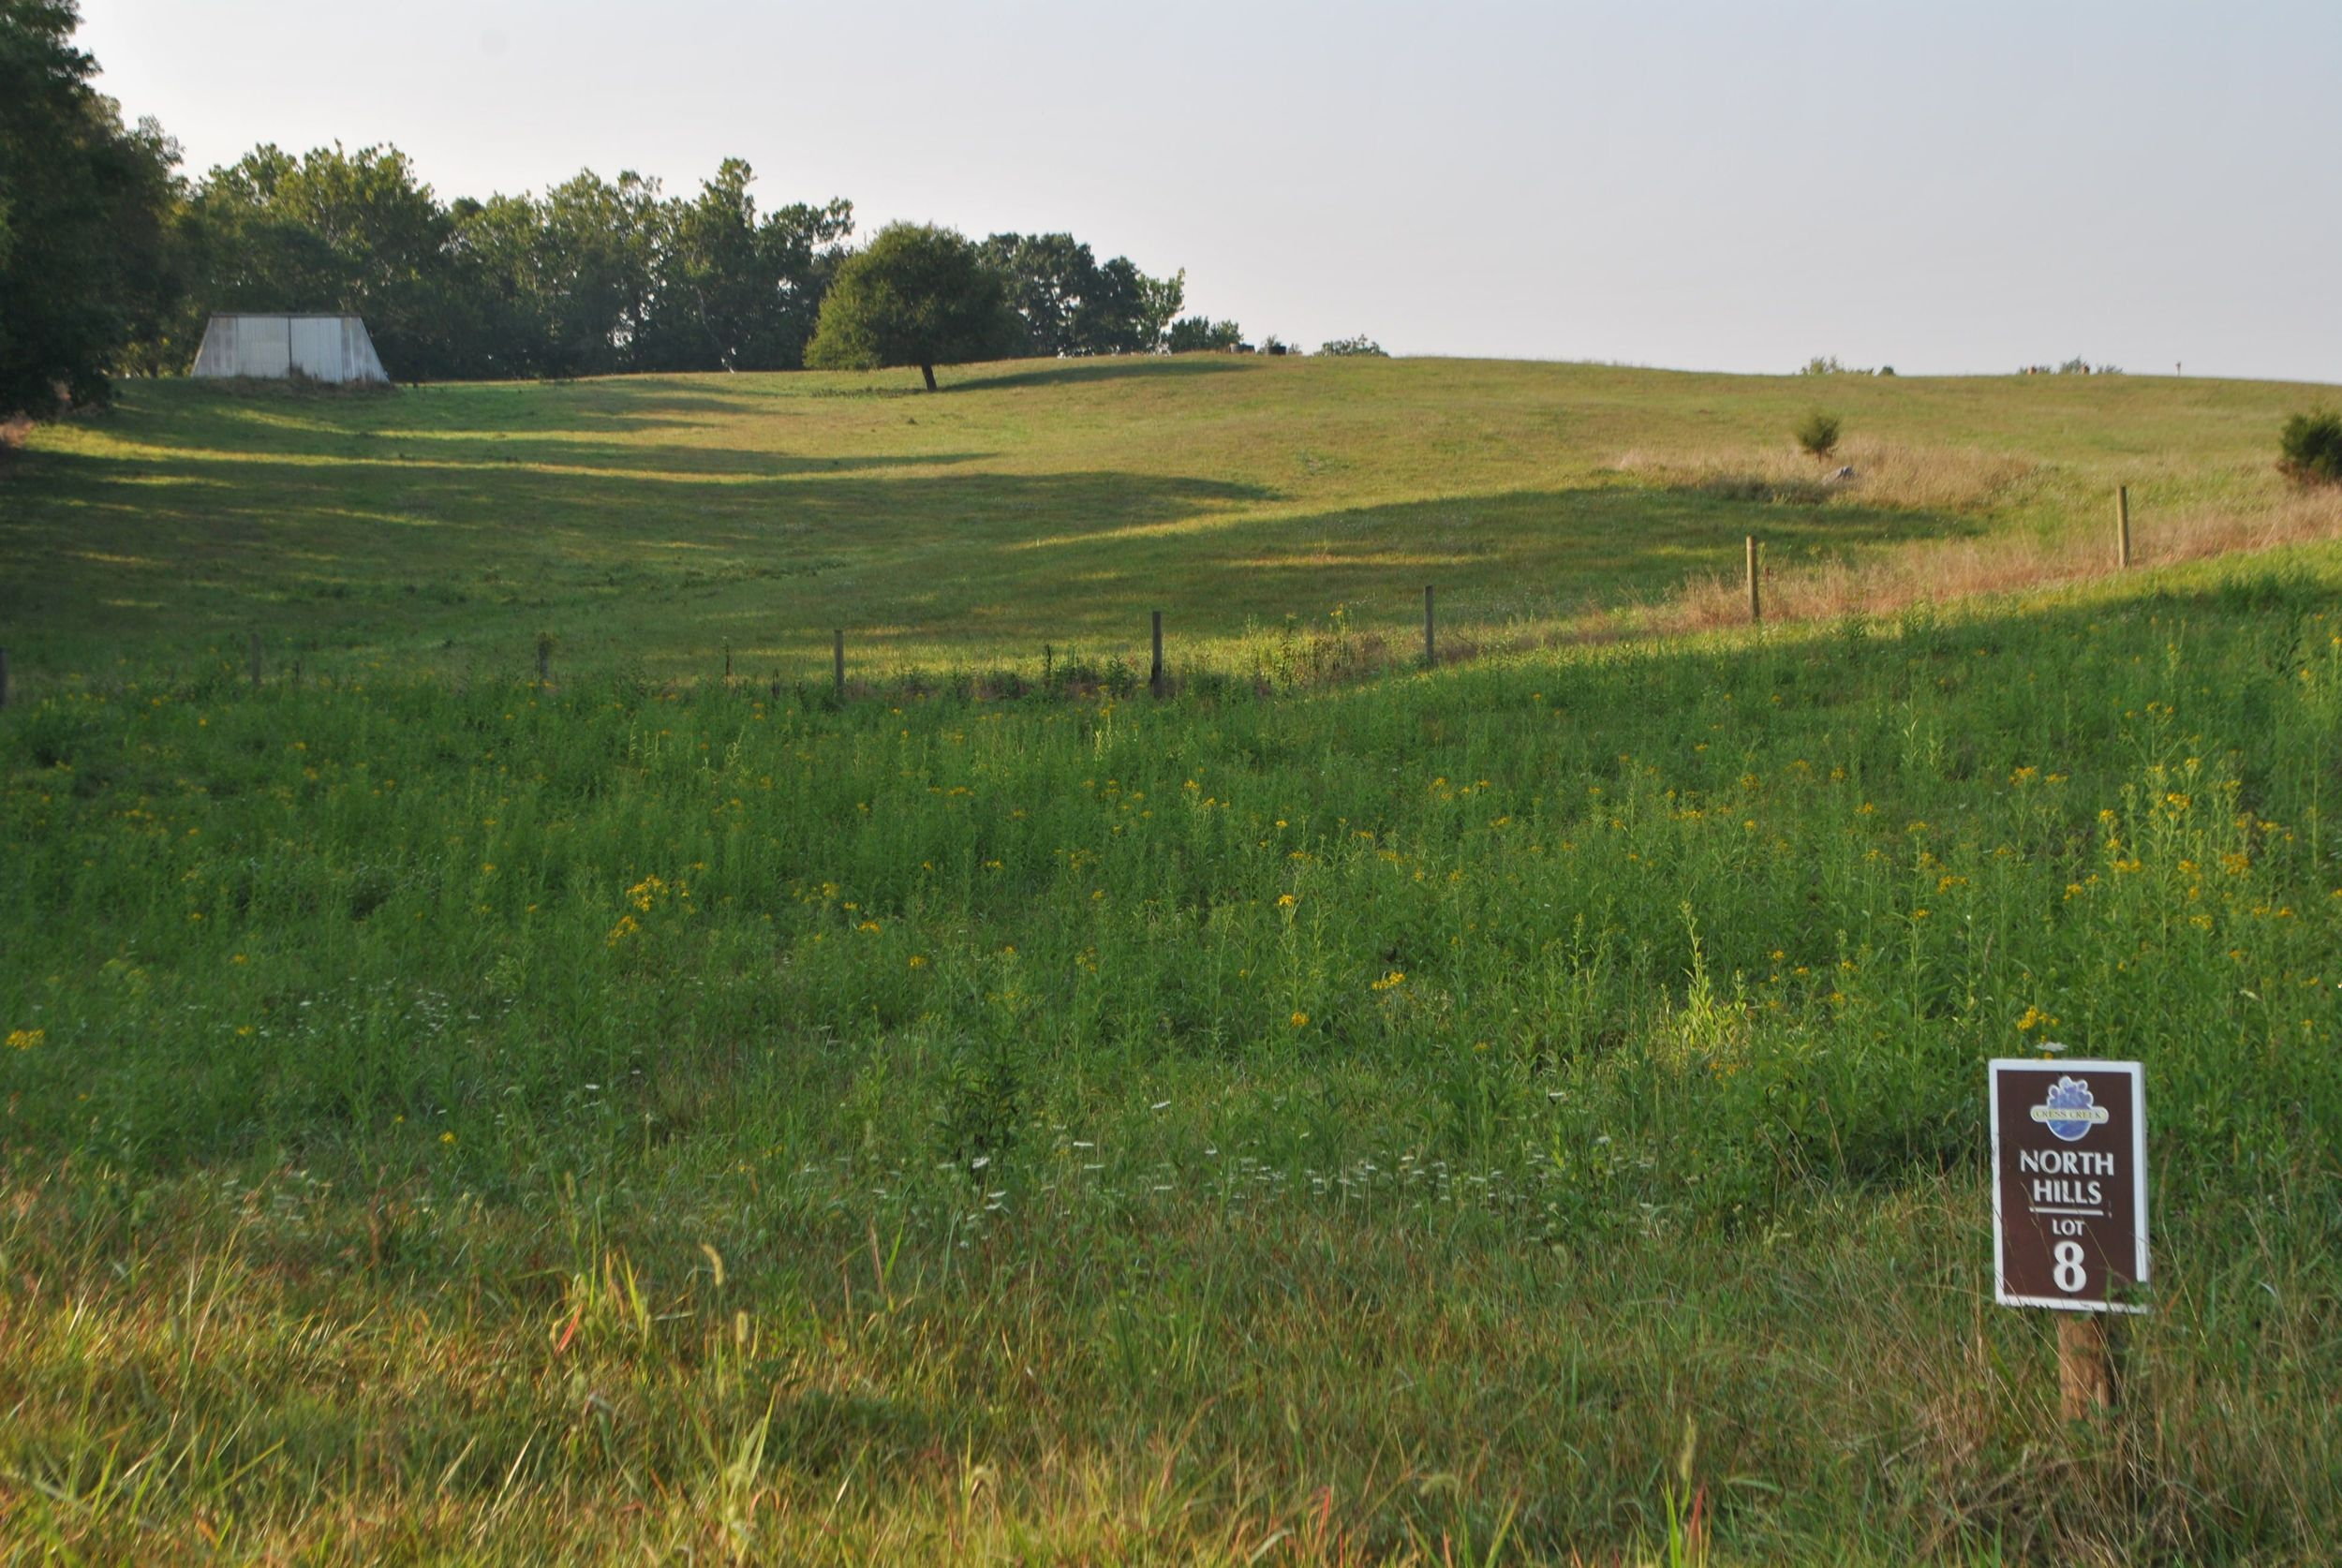 Neighboring Farm looking over lot #8